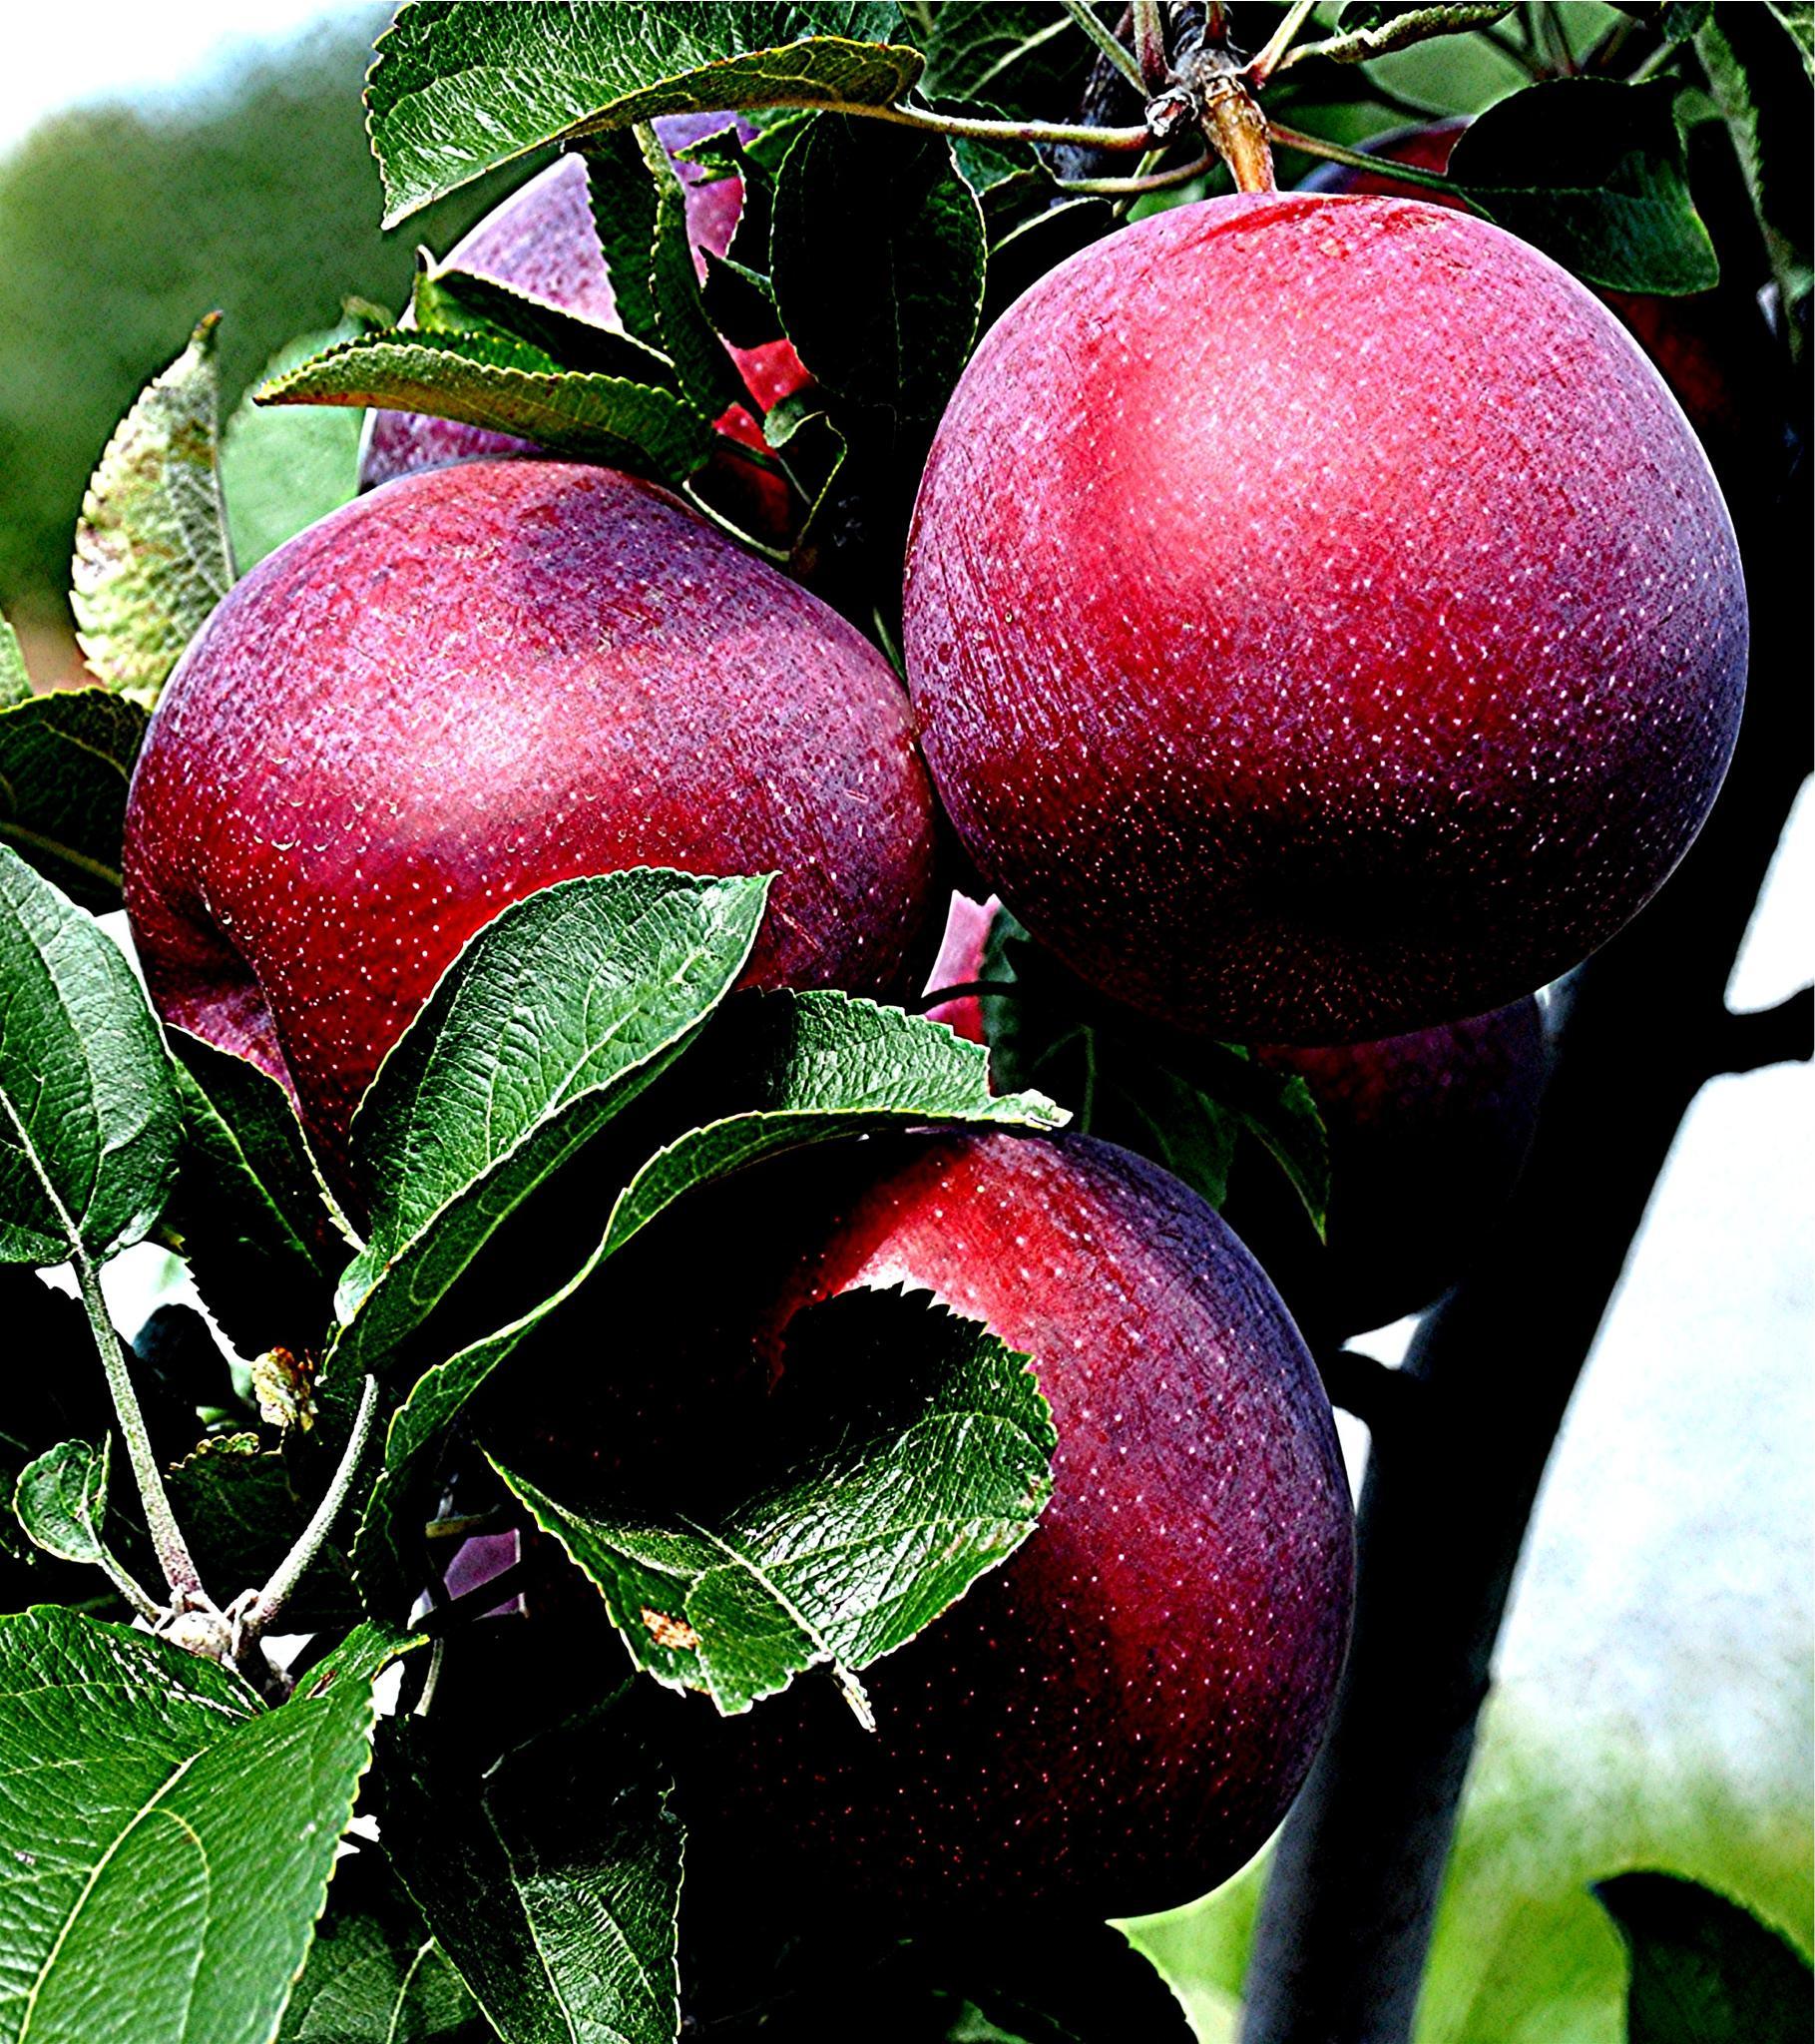 Orchard Beauties by Joeski